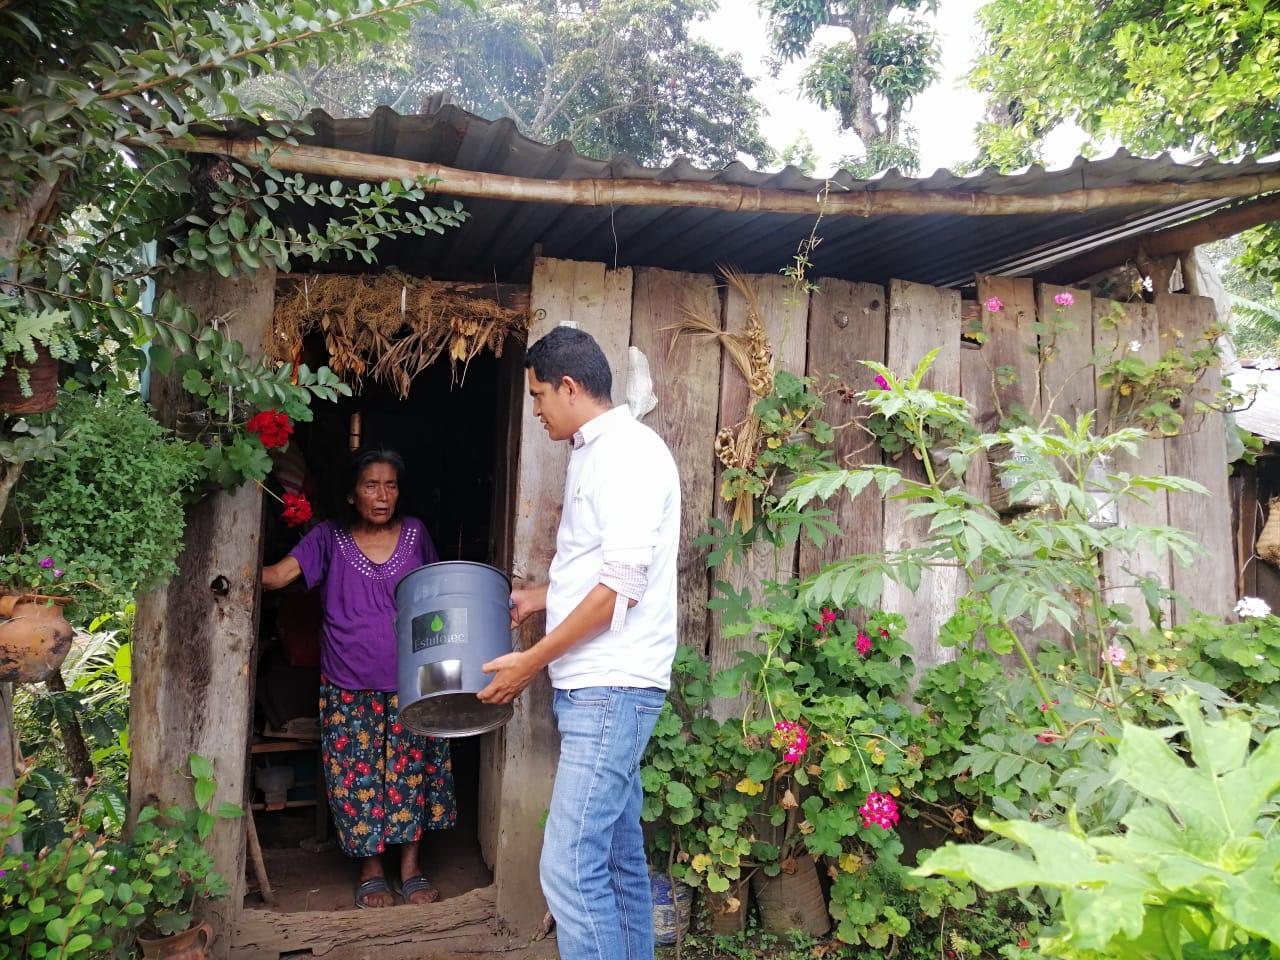 TecNM campus Xalapa entrega 17 estufas ecológicas a comunidades rurales de Veracruz